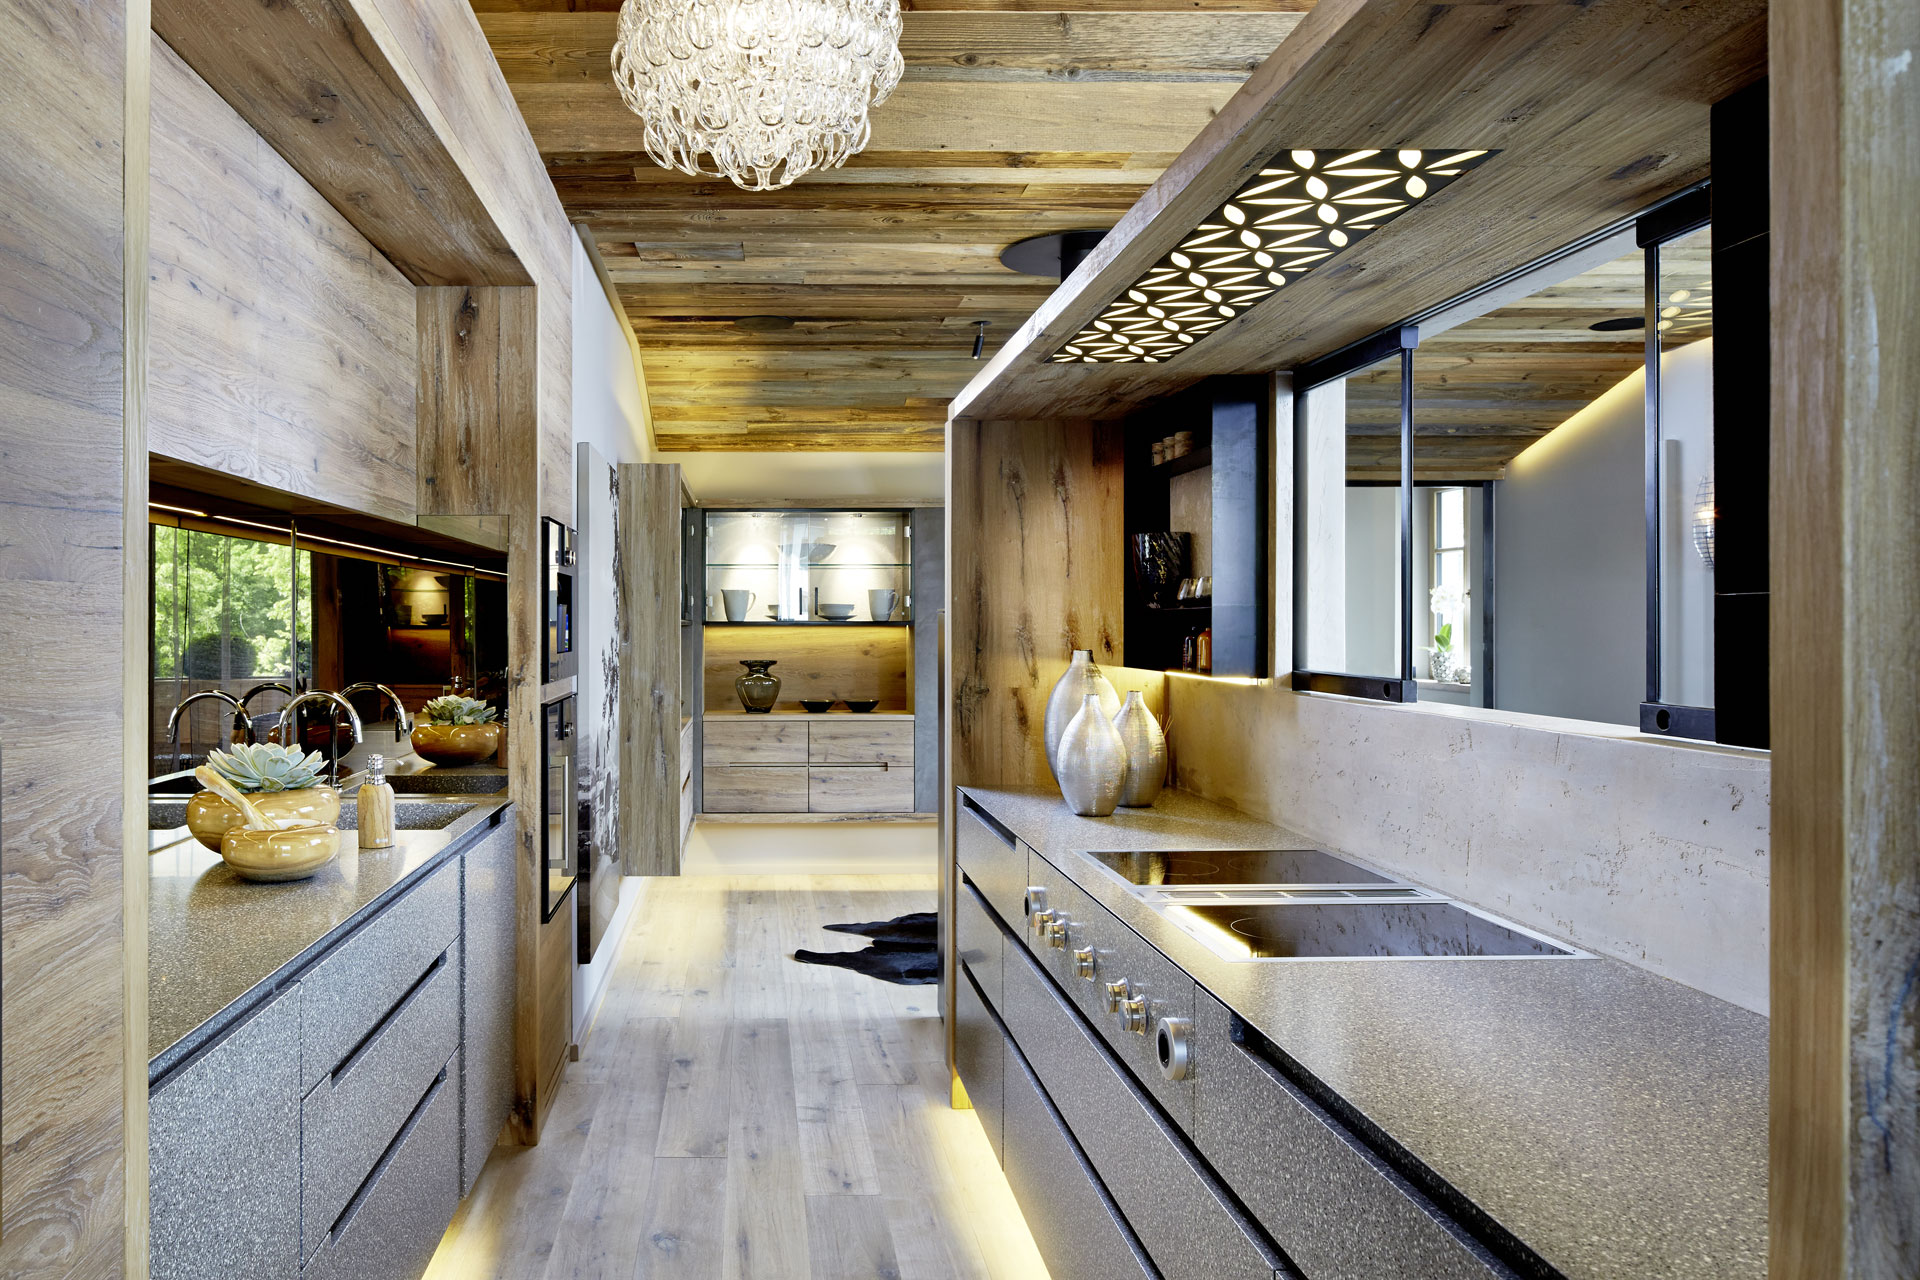 interior fotografie lifestyle hotel architektur panorama. Black Bedroom Furniture Sets. Home Design Ideas